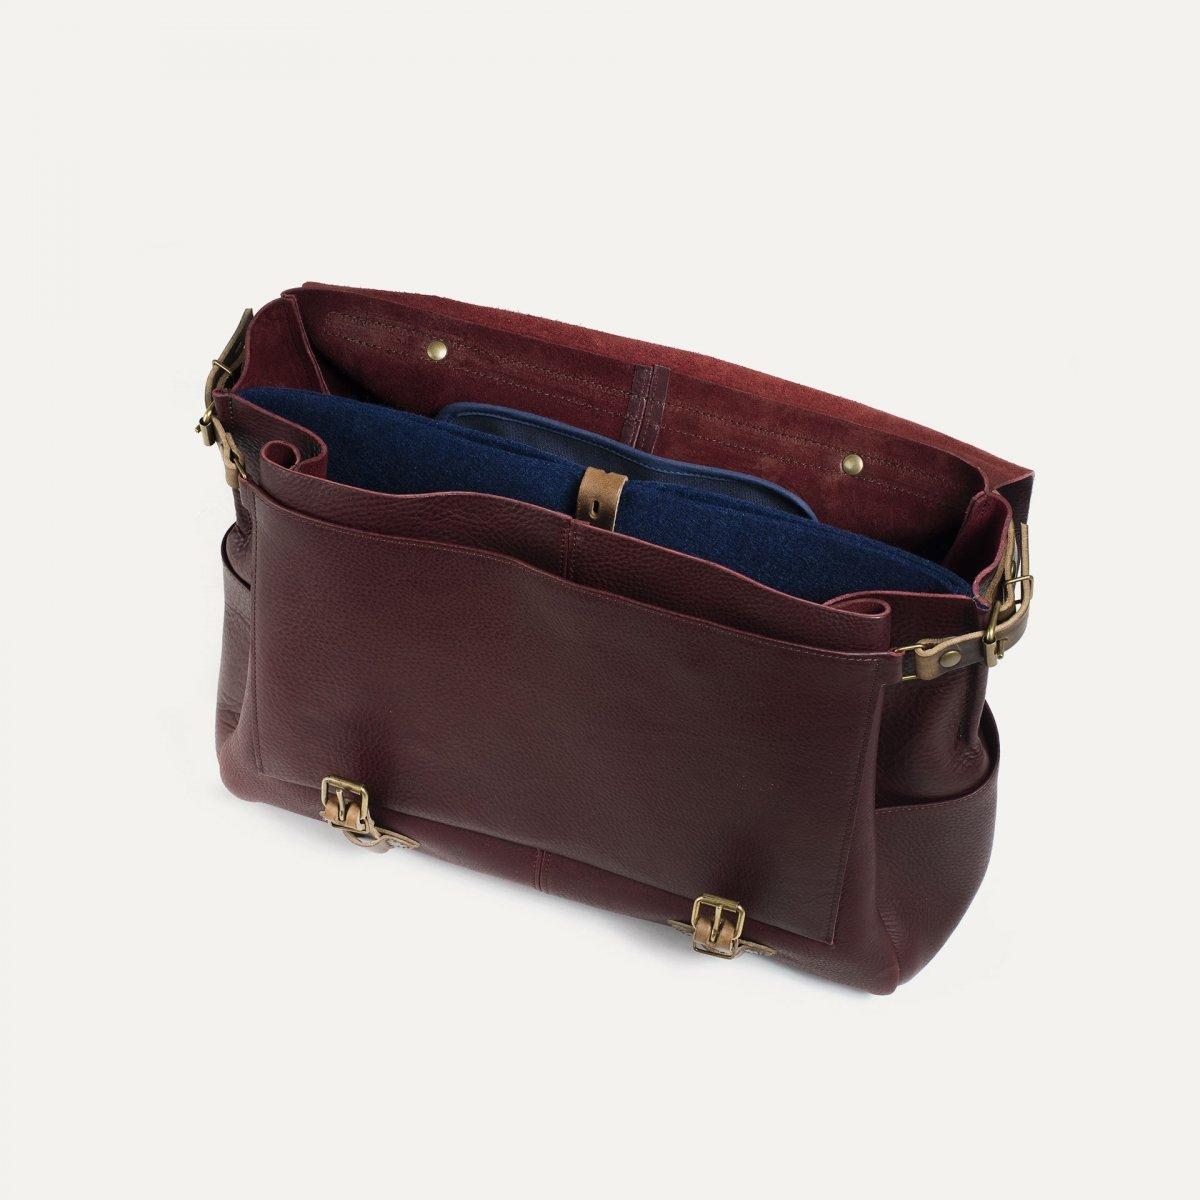 48h Irving Executive Postman bag - Peat (image n°4)